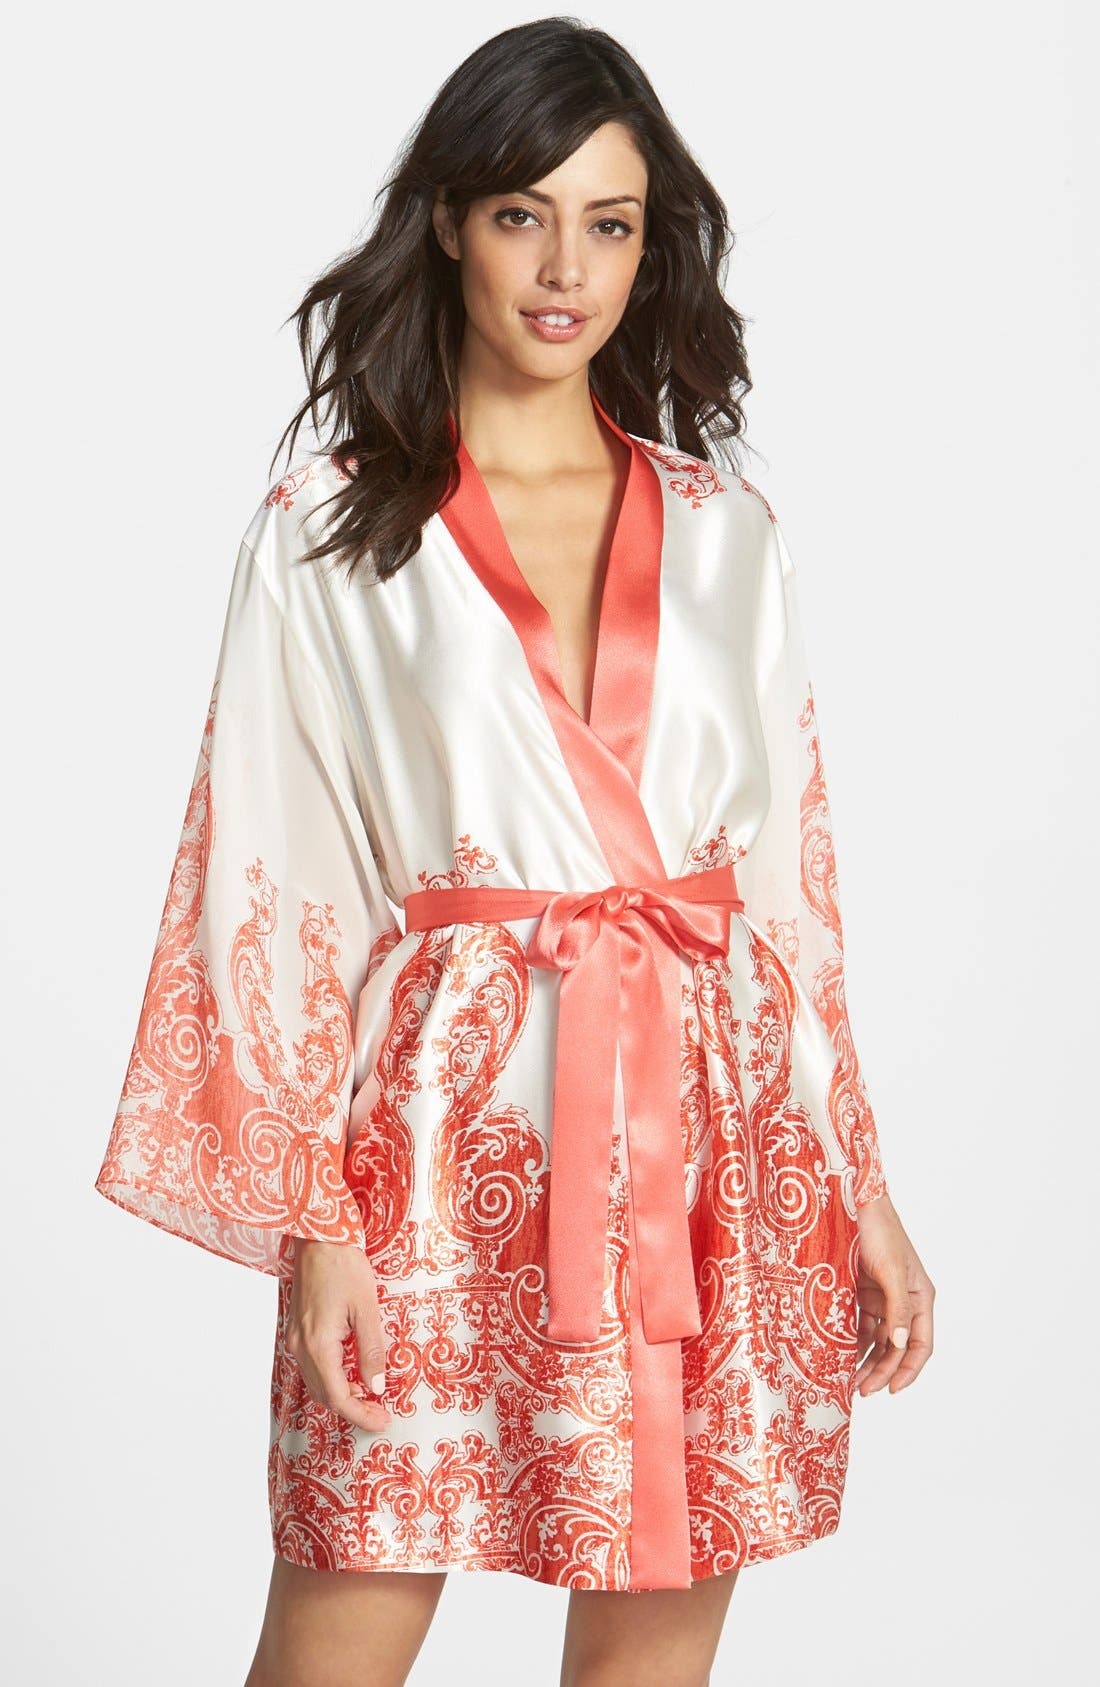 Alternate Image 1 Selected - Oscar de la Renta 'Vintage Trellis' Satin & Georgette Wrap Robe